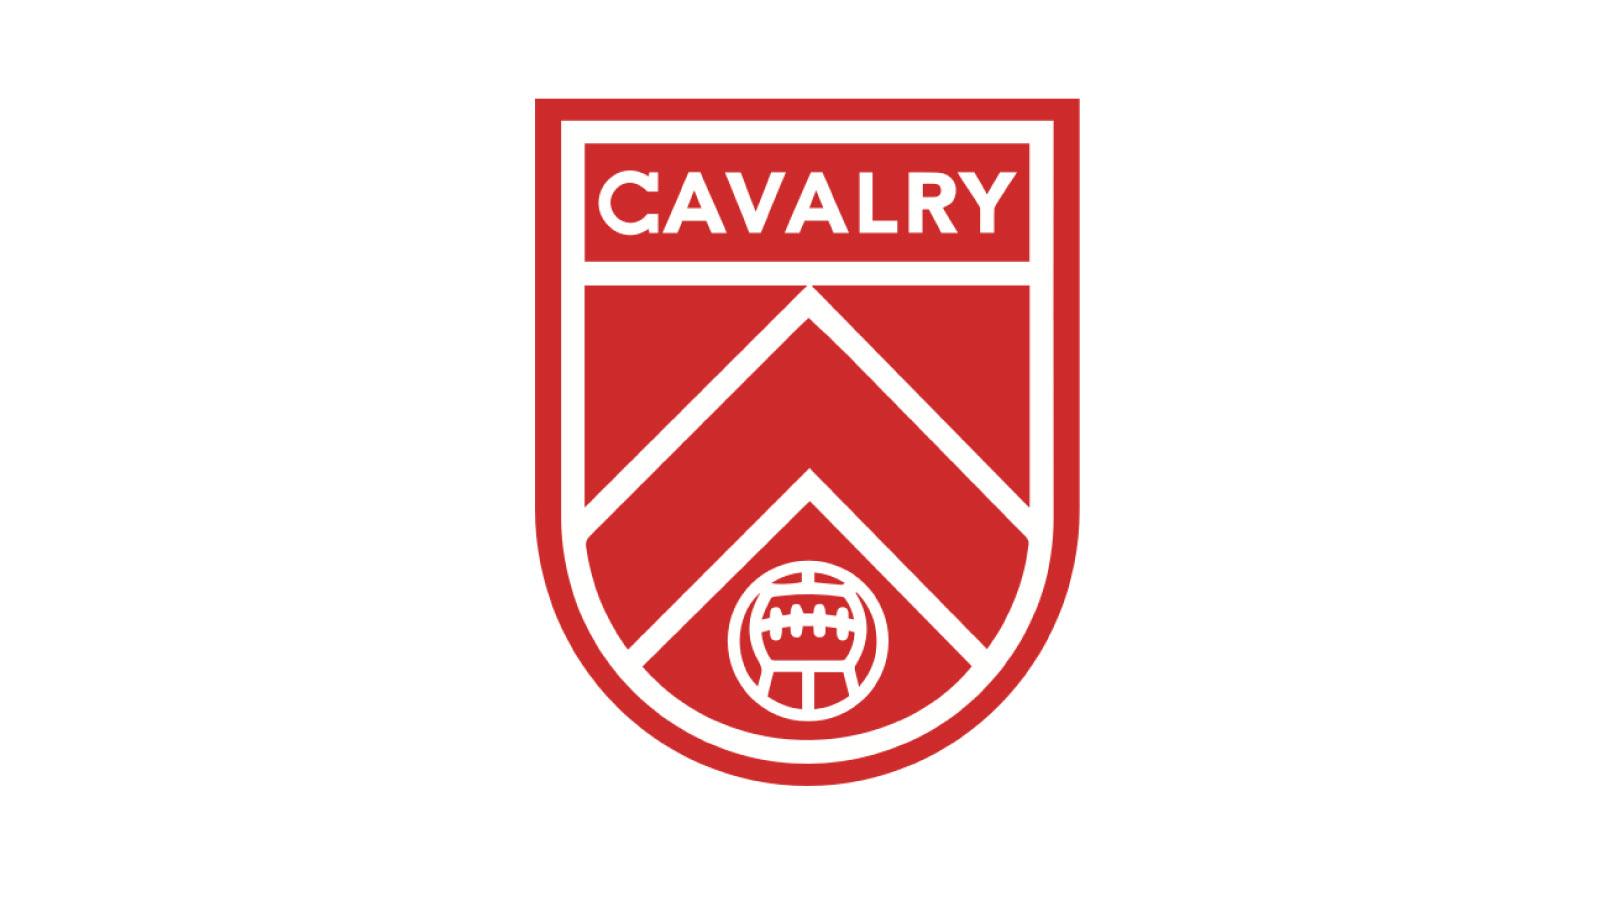 cavalry-logo